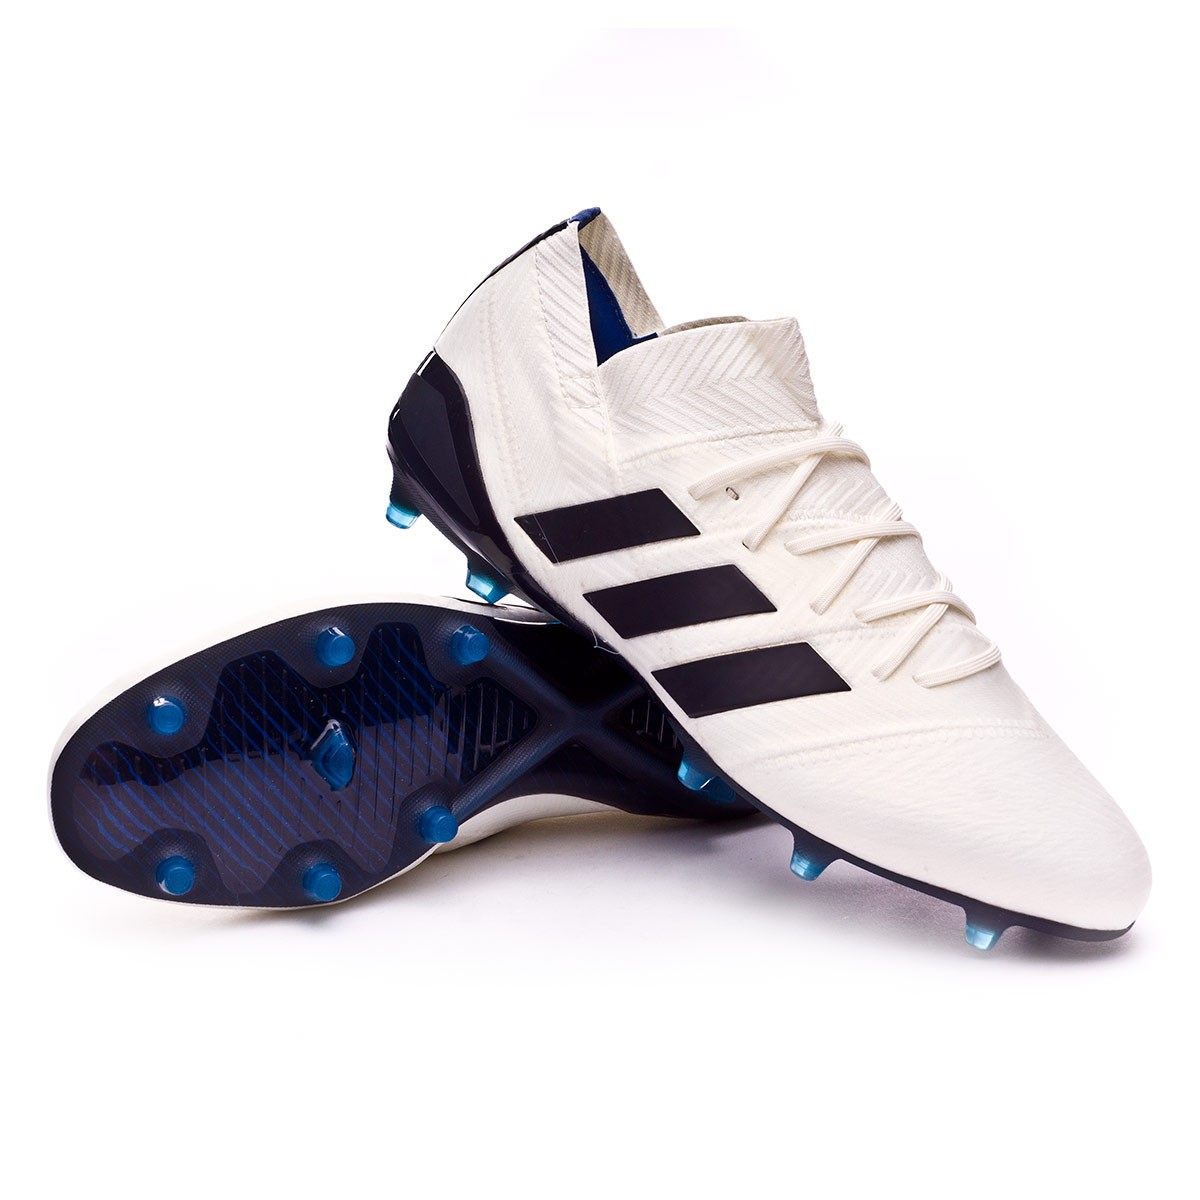 9e71a4a7dac8 Football Boots adidas Woman Nemeziz 18.1 FG Off white-Legend ink ...